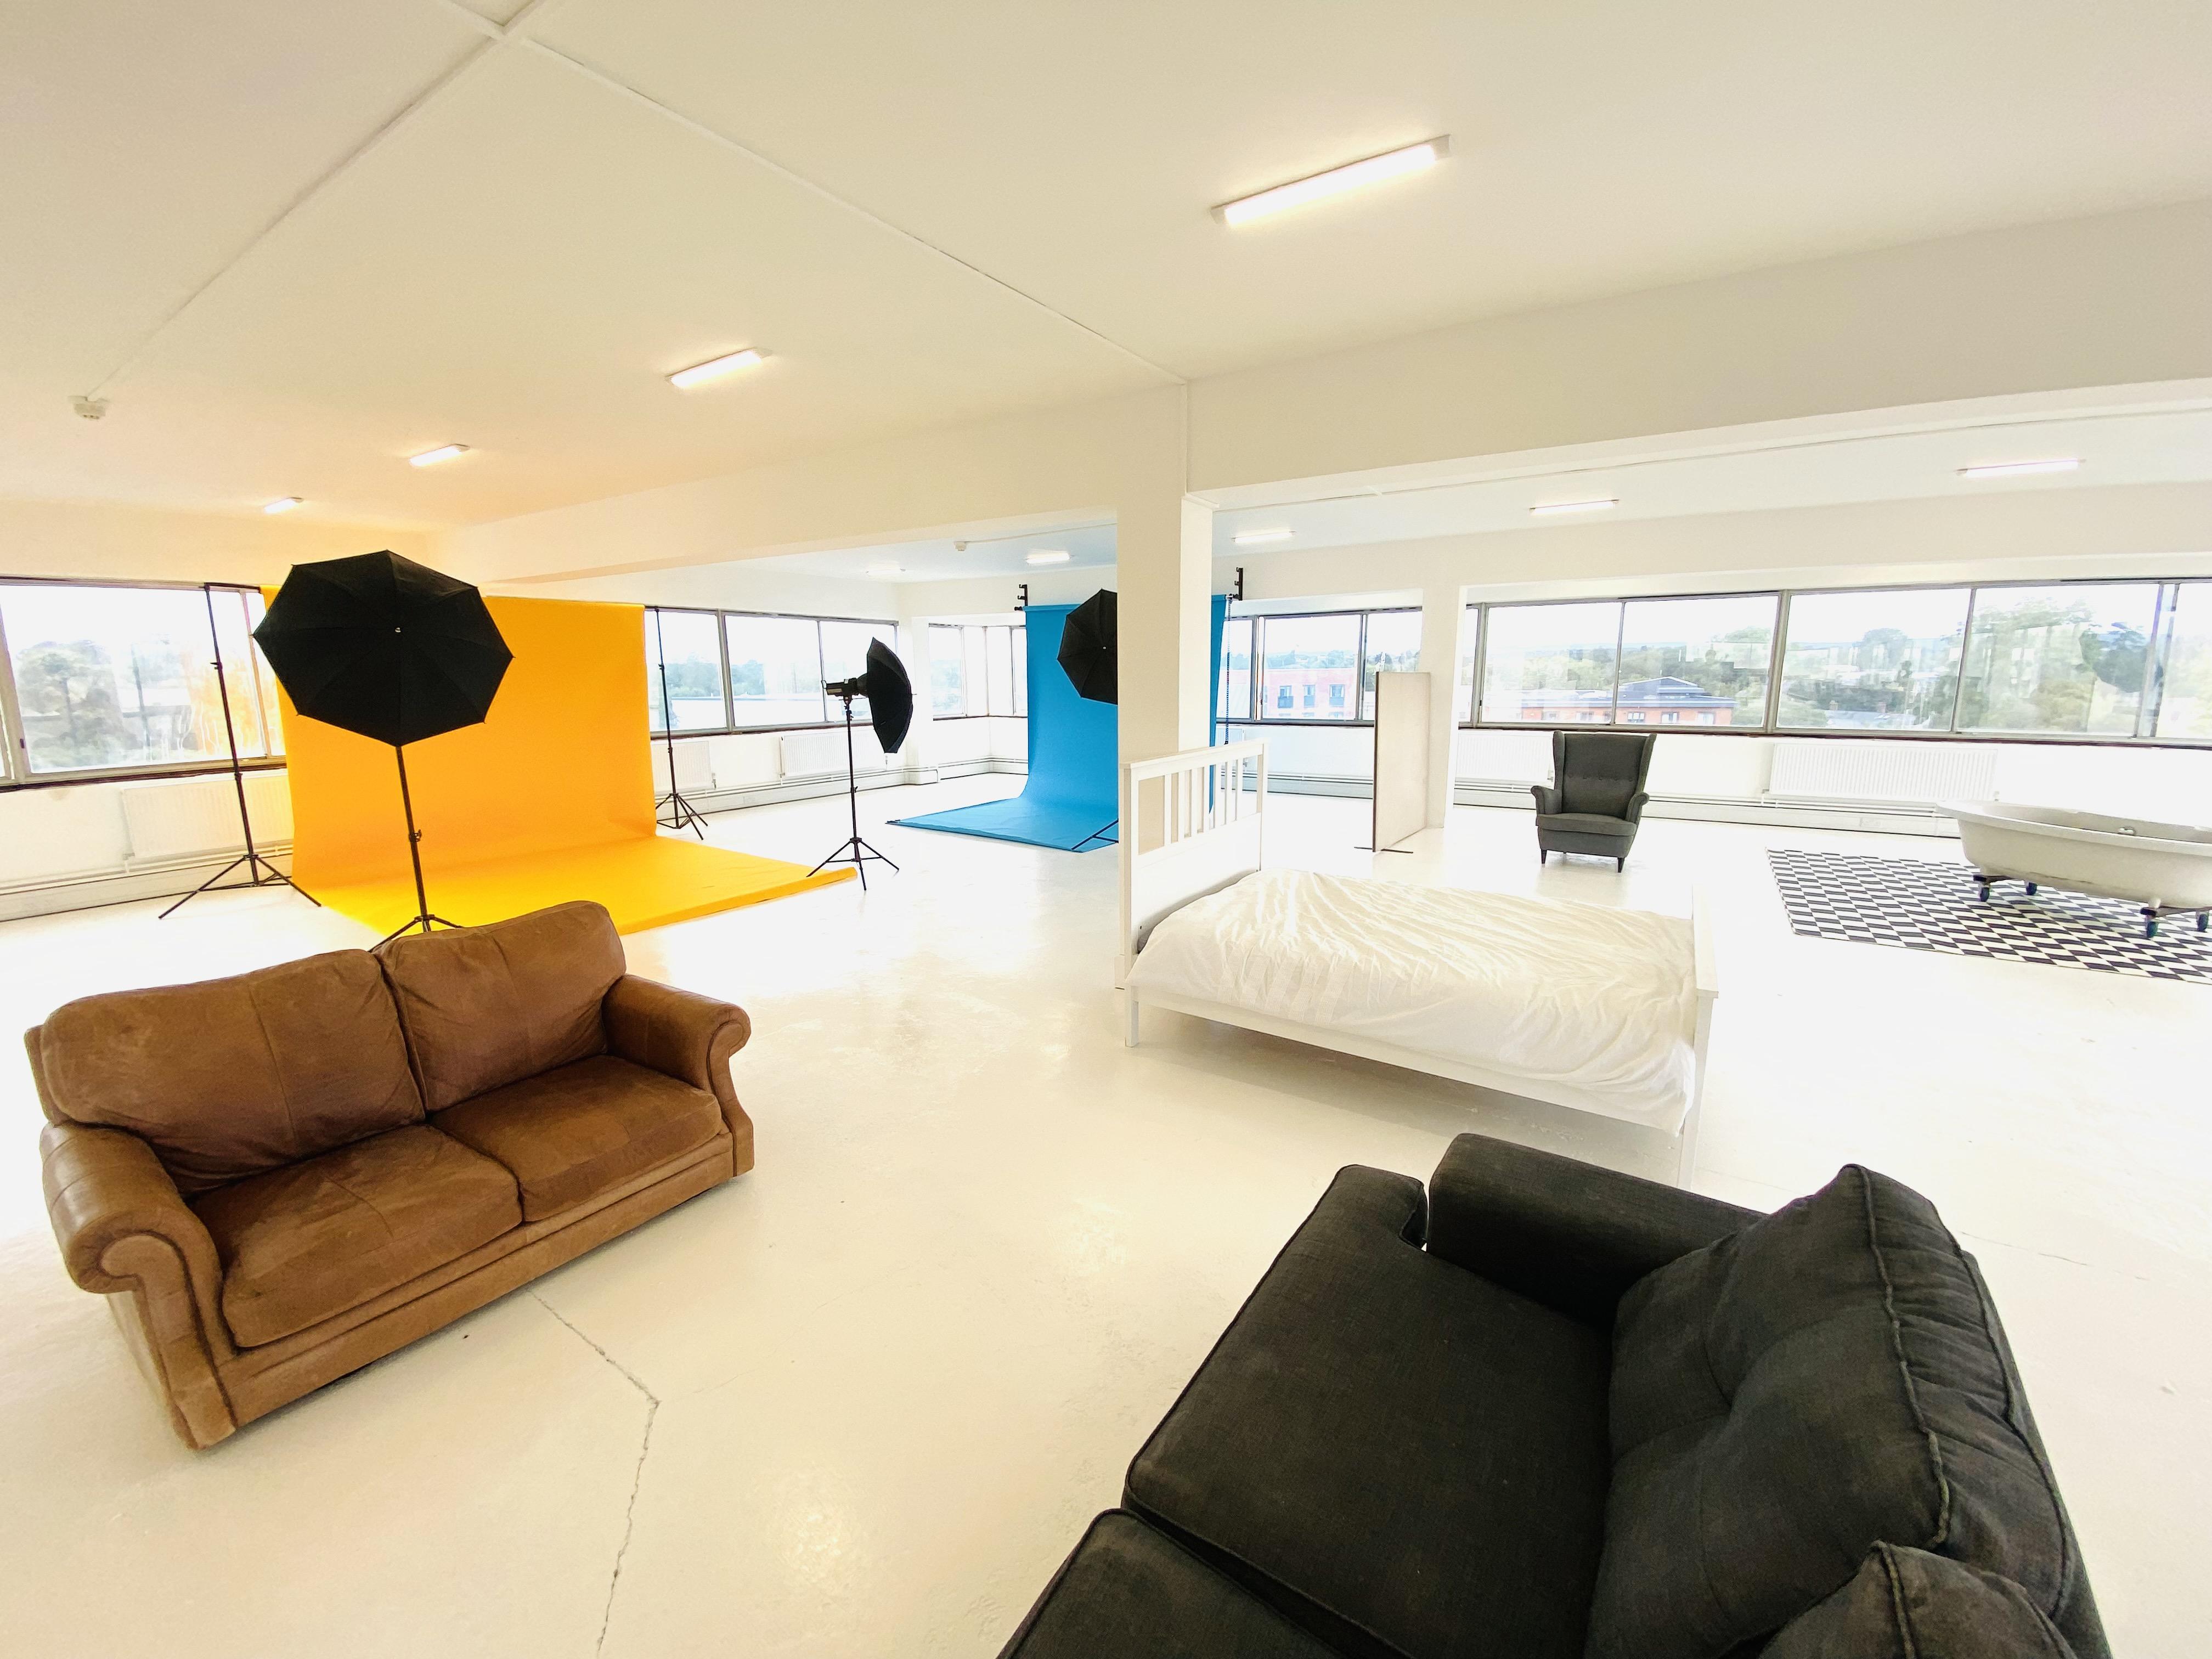 Studio Rental : HiveStudios @ Andover